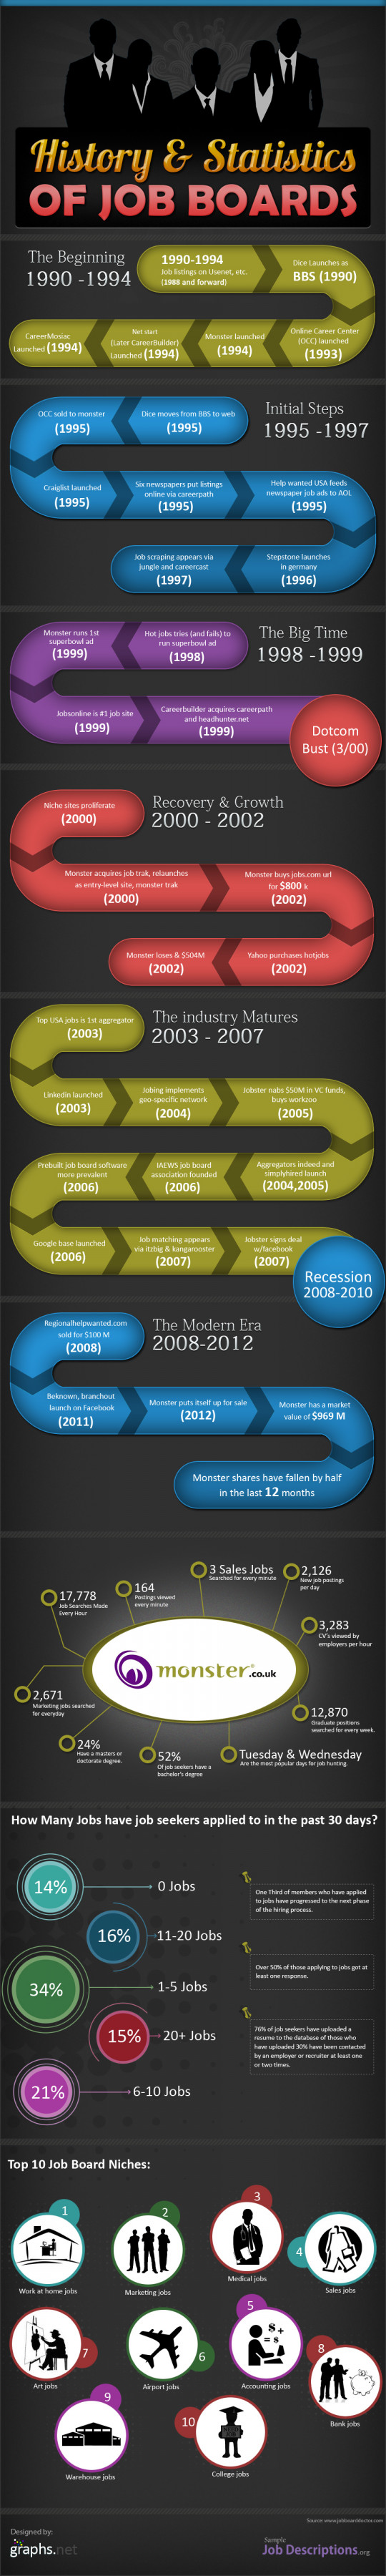 History statistics of job boards